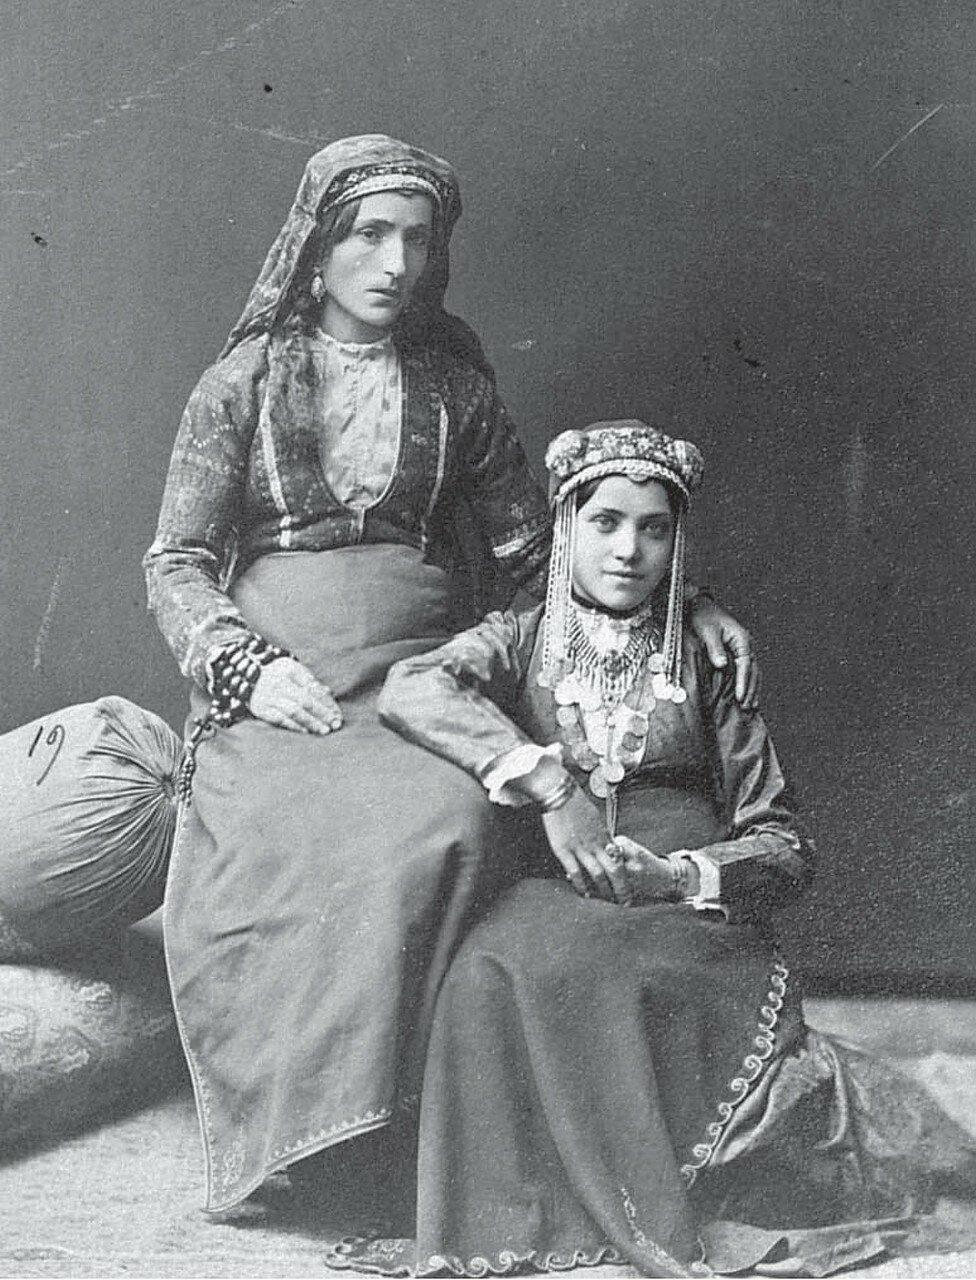 Армянские женщины из Ахалцыха